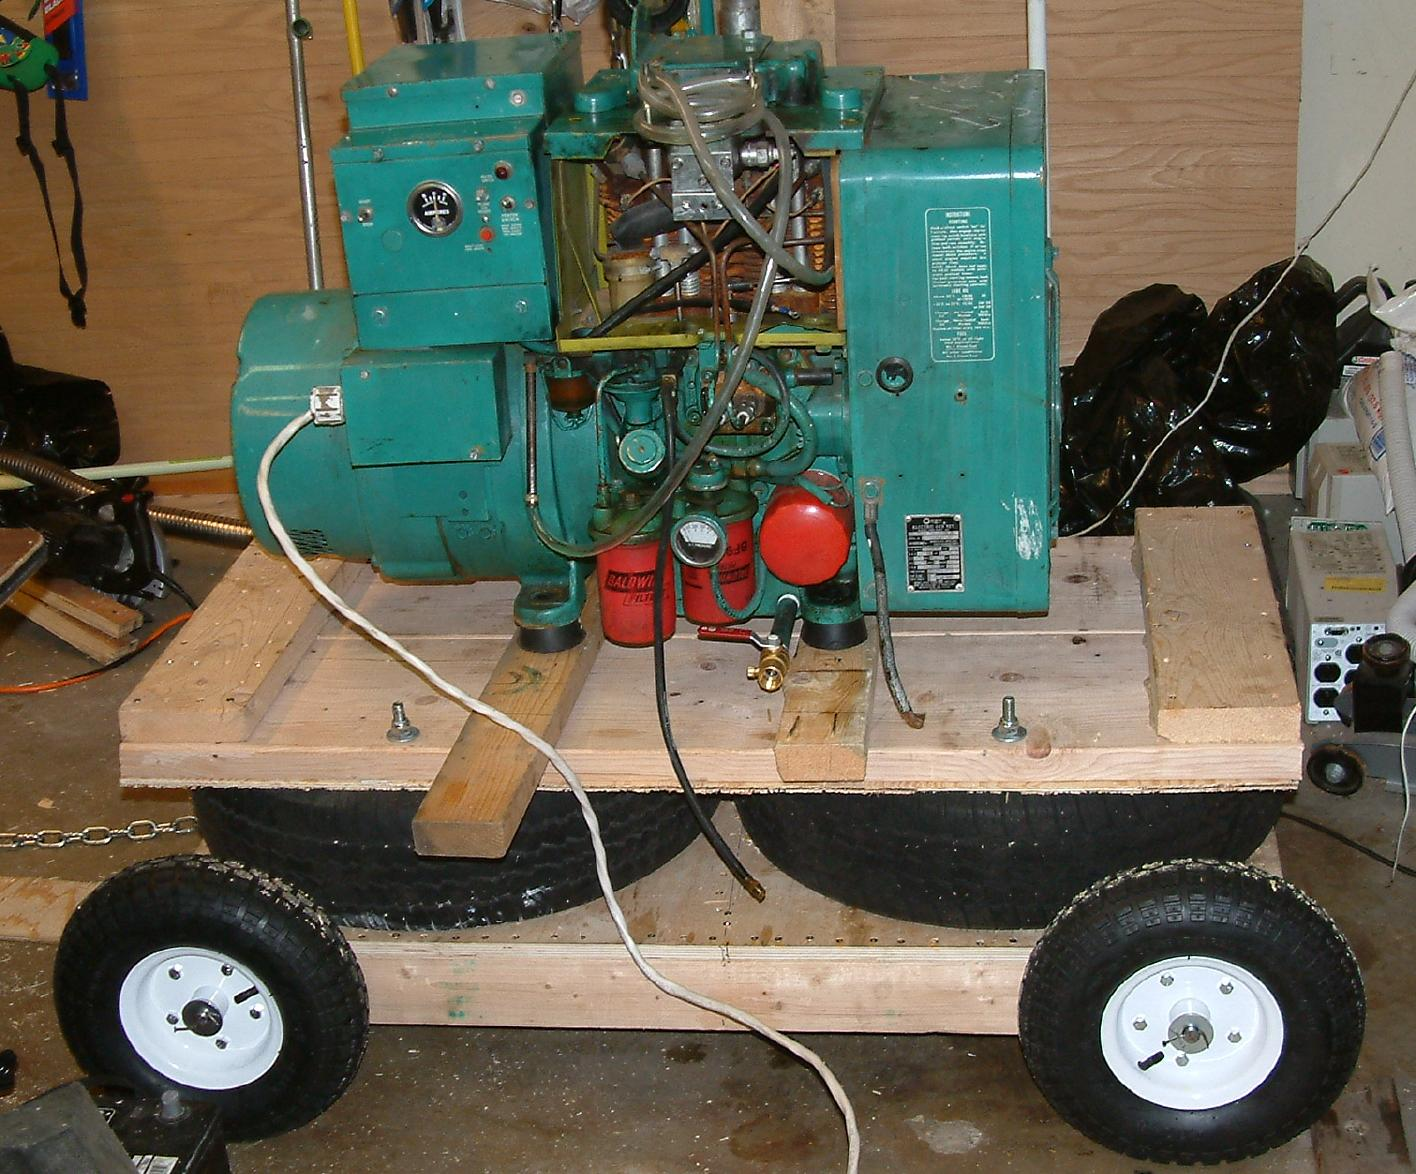 Re: ANOTHER Onan DJE generator starting problem! (Thursday)